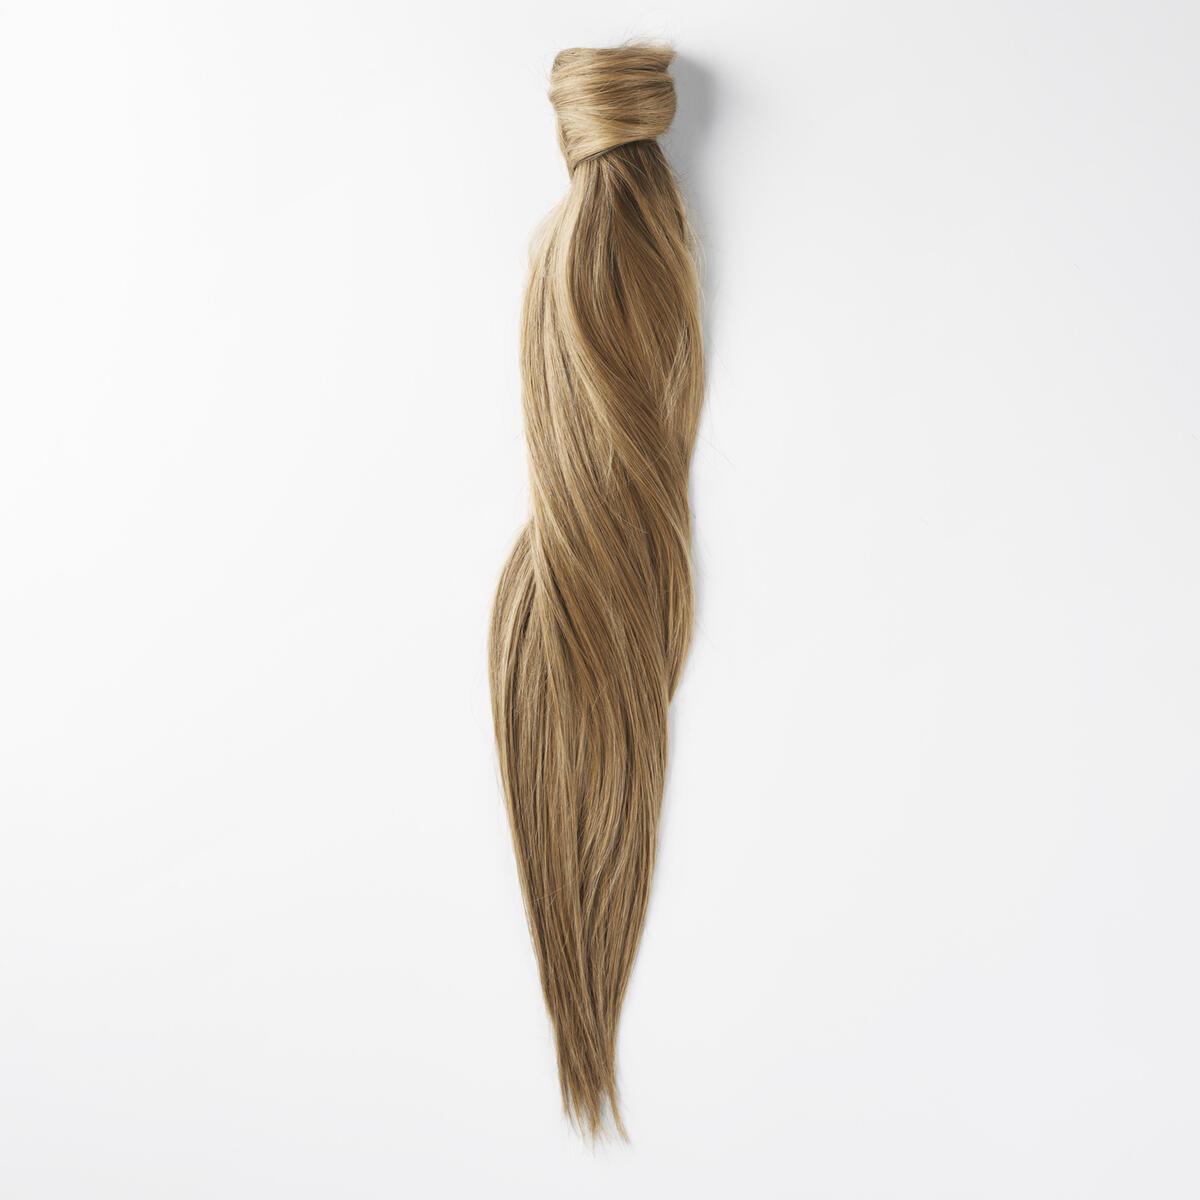 Clip-in Ponytail Original C2.0/5.1 Dark Blonde Toffee ColorMelt 50 cm